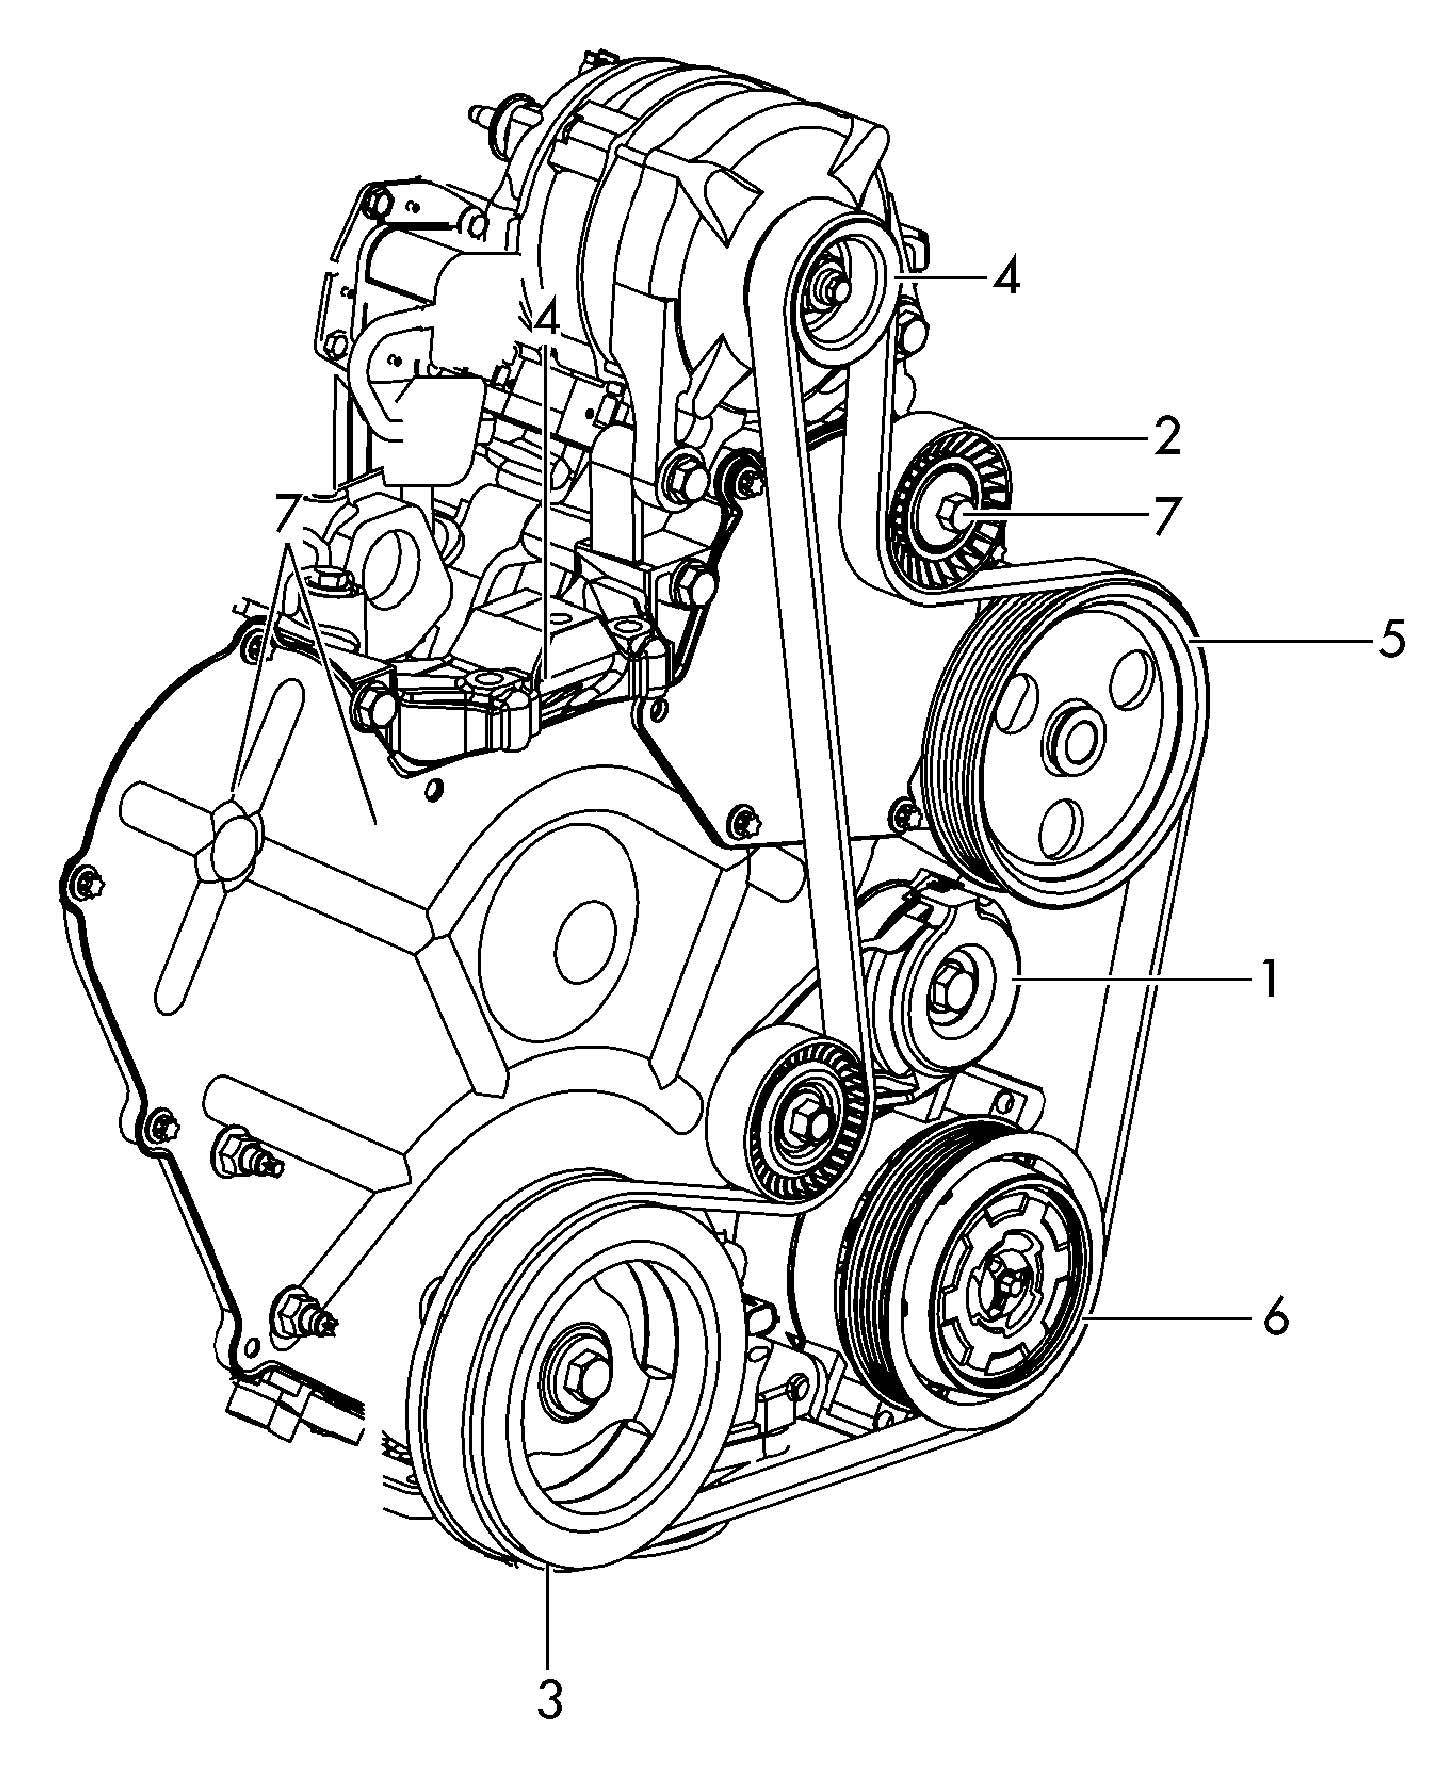 [DIAGRAM] 2008 Volkswagen Routan Fuse Diagram FULL Version